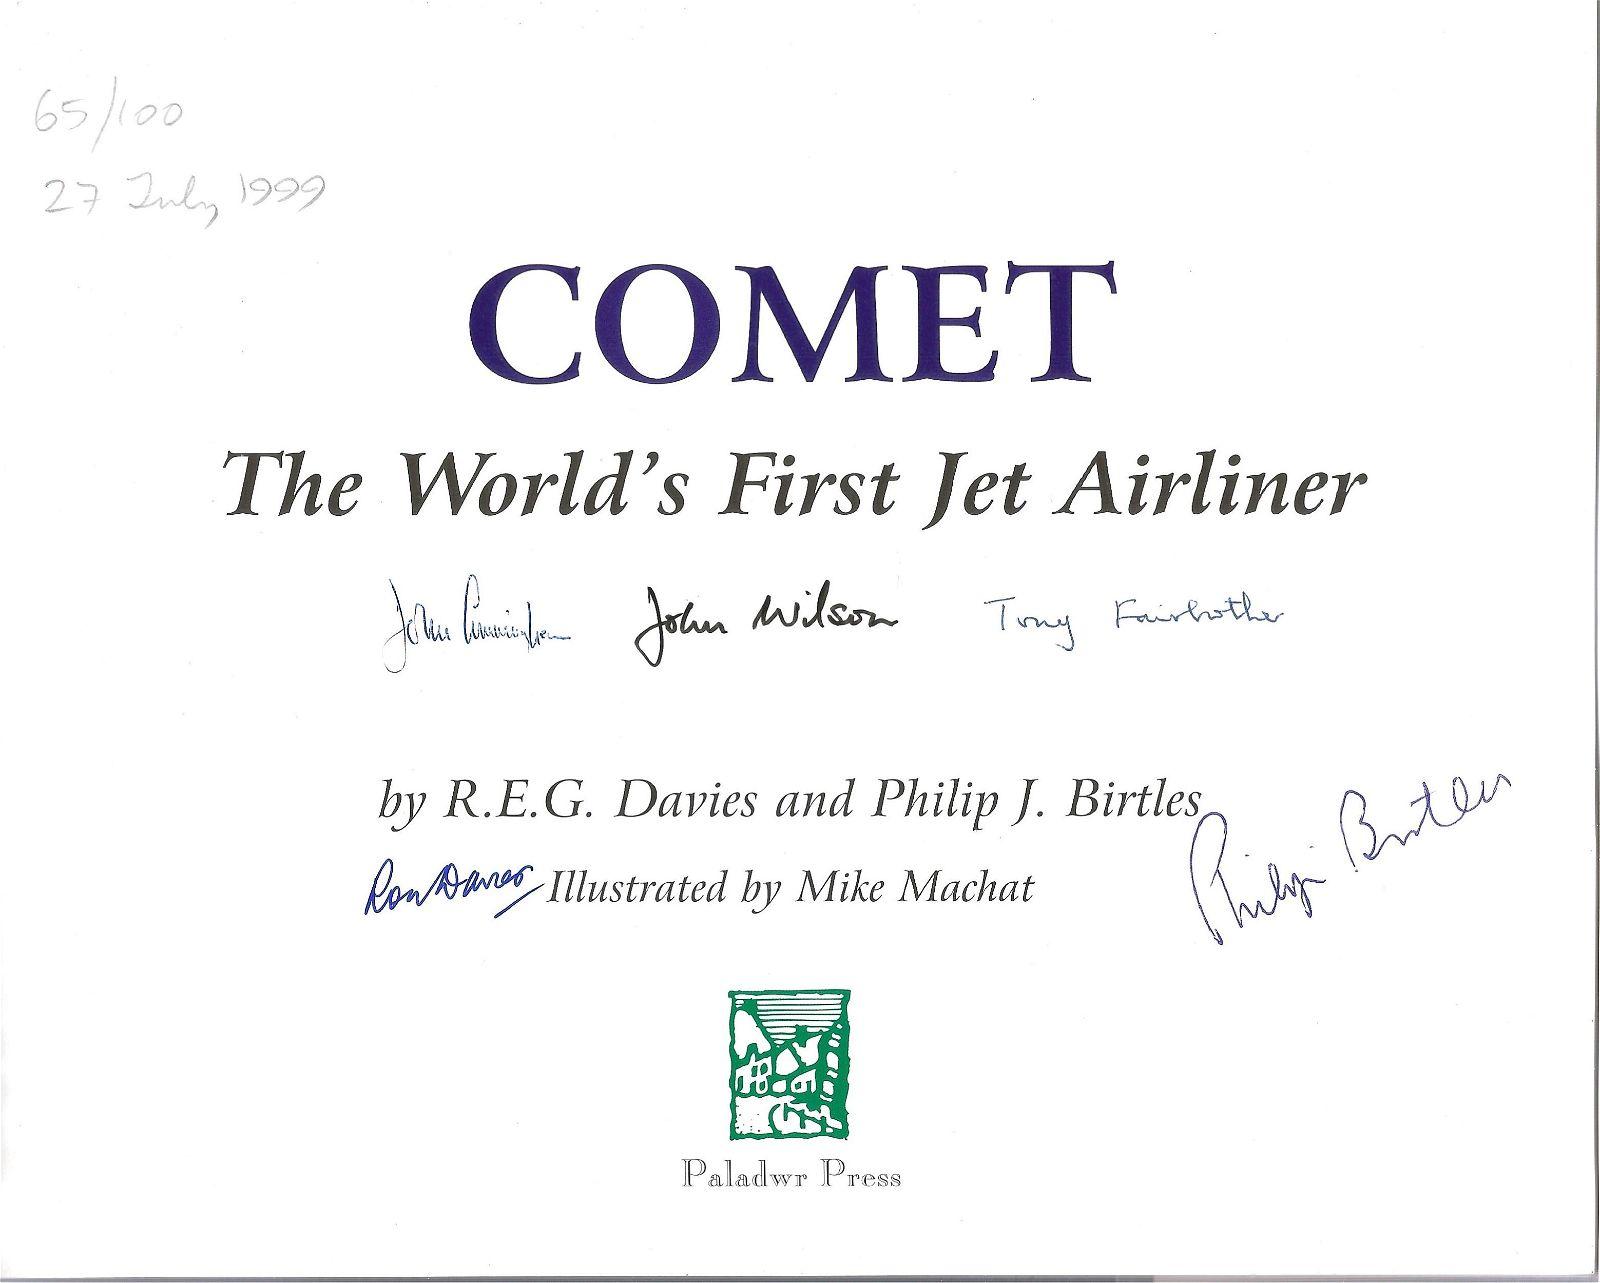 WW2 ace John Cunningham multi signed book Comet The